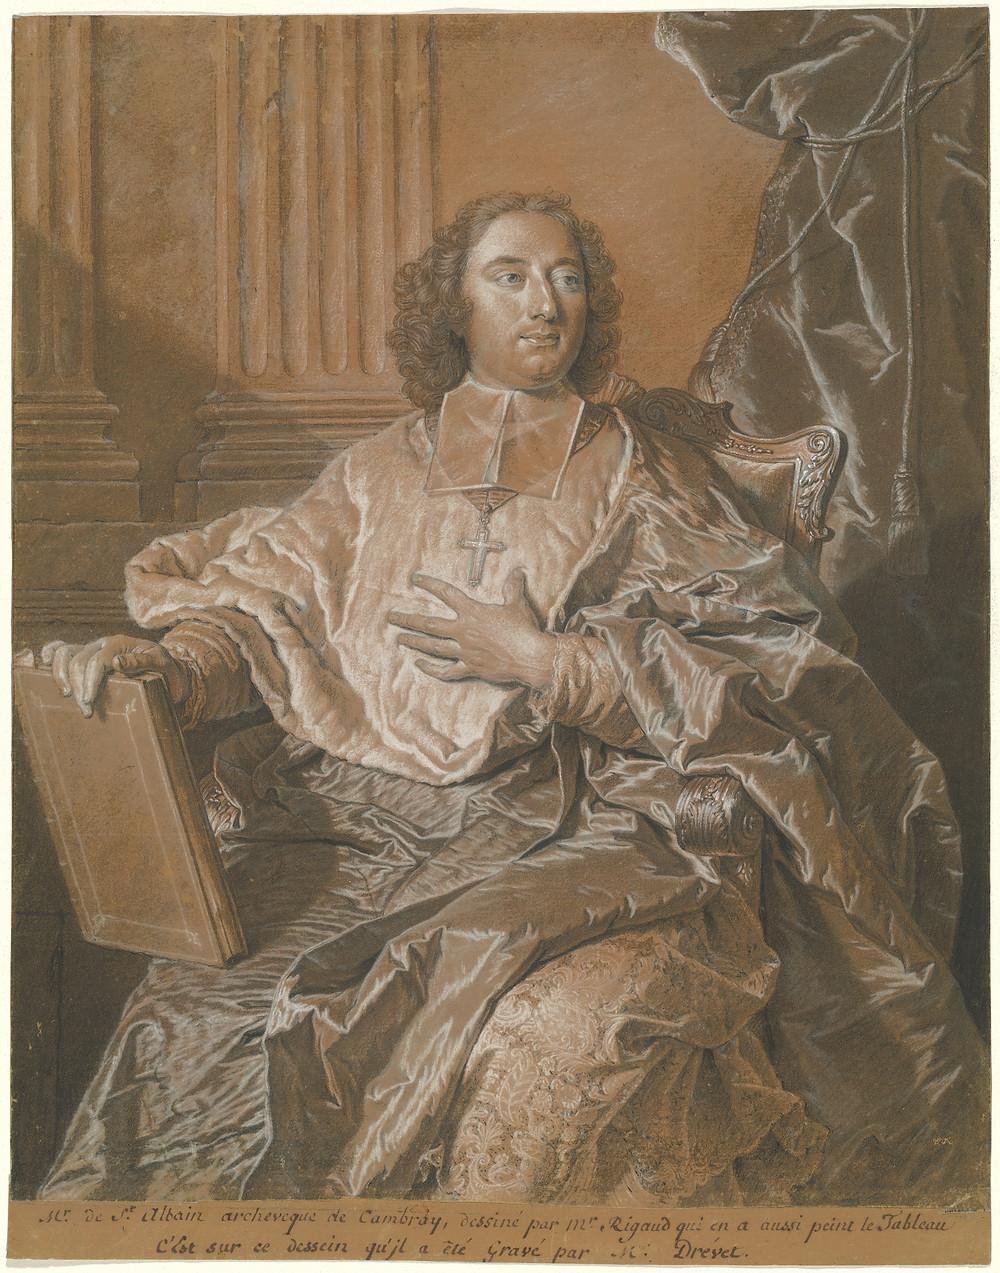 Hyacinthe Rigaud, Portrait de Mgr de Saint-Albin, avant 1741, Washington, National Gallery of Art, inv. 2002.27.1